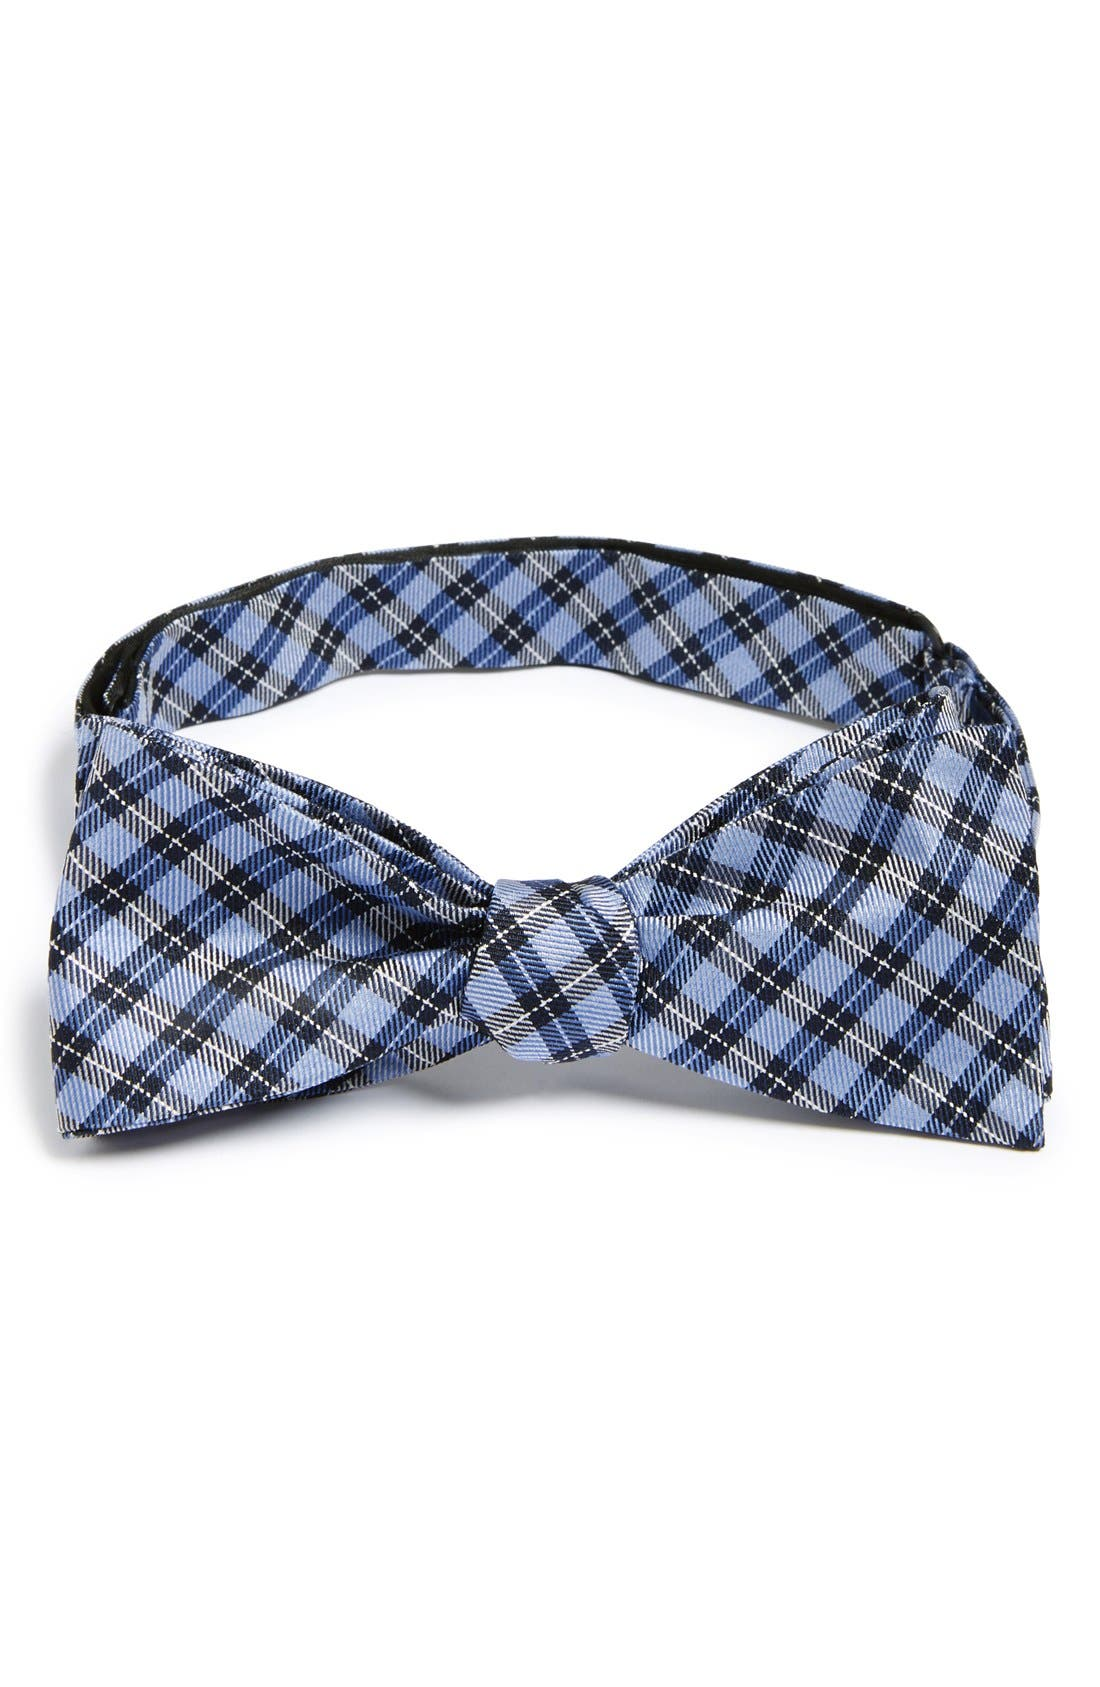 1901 'Choi' Check Silk Bow Tie